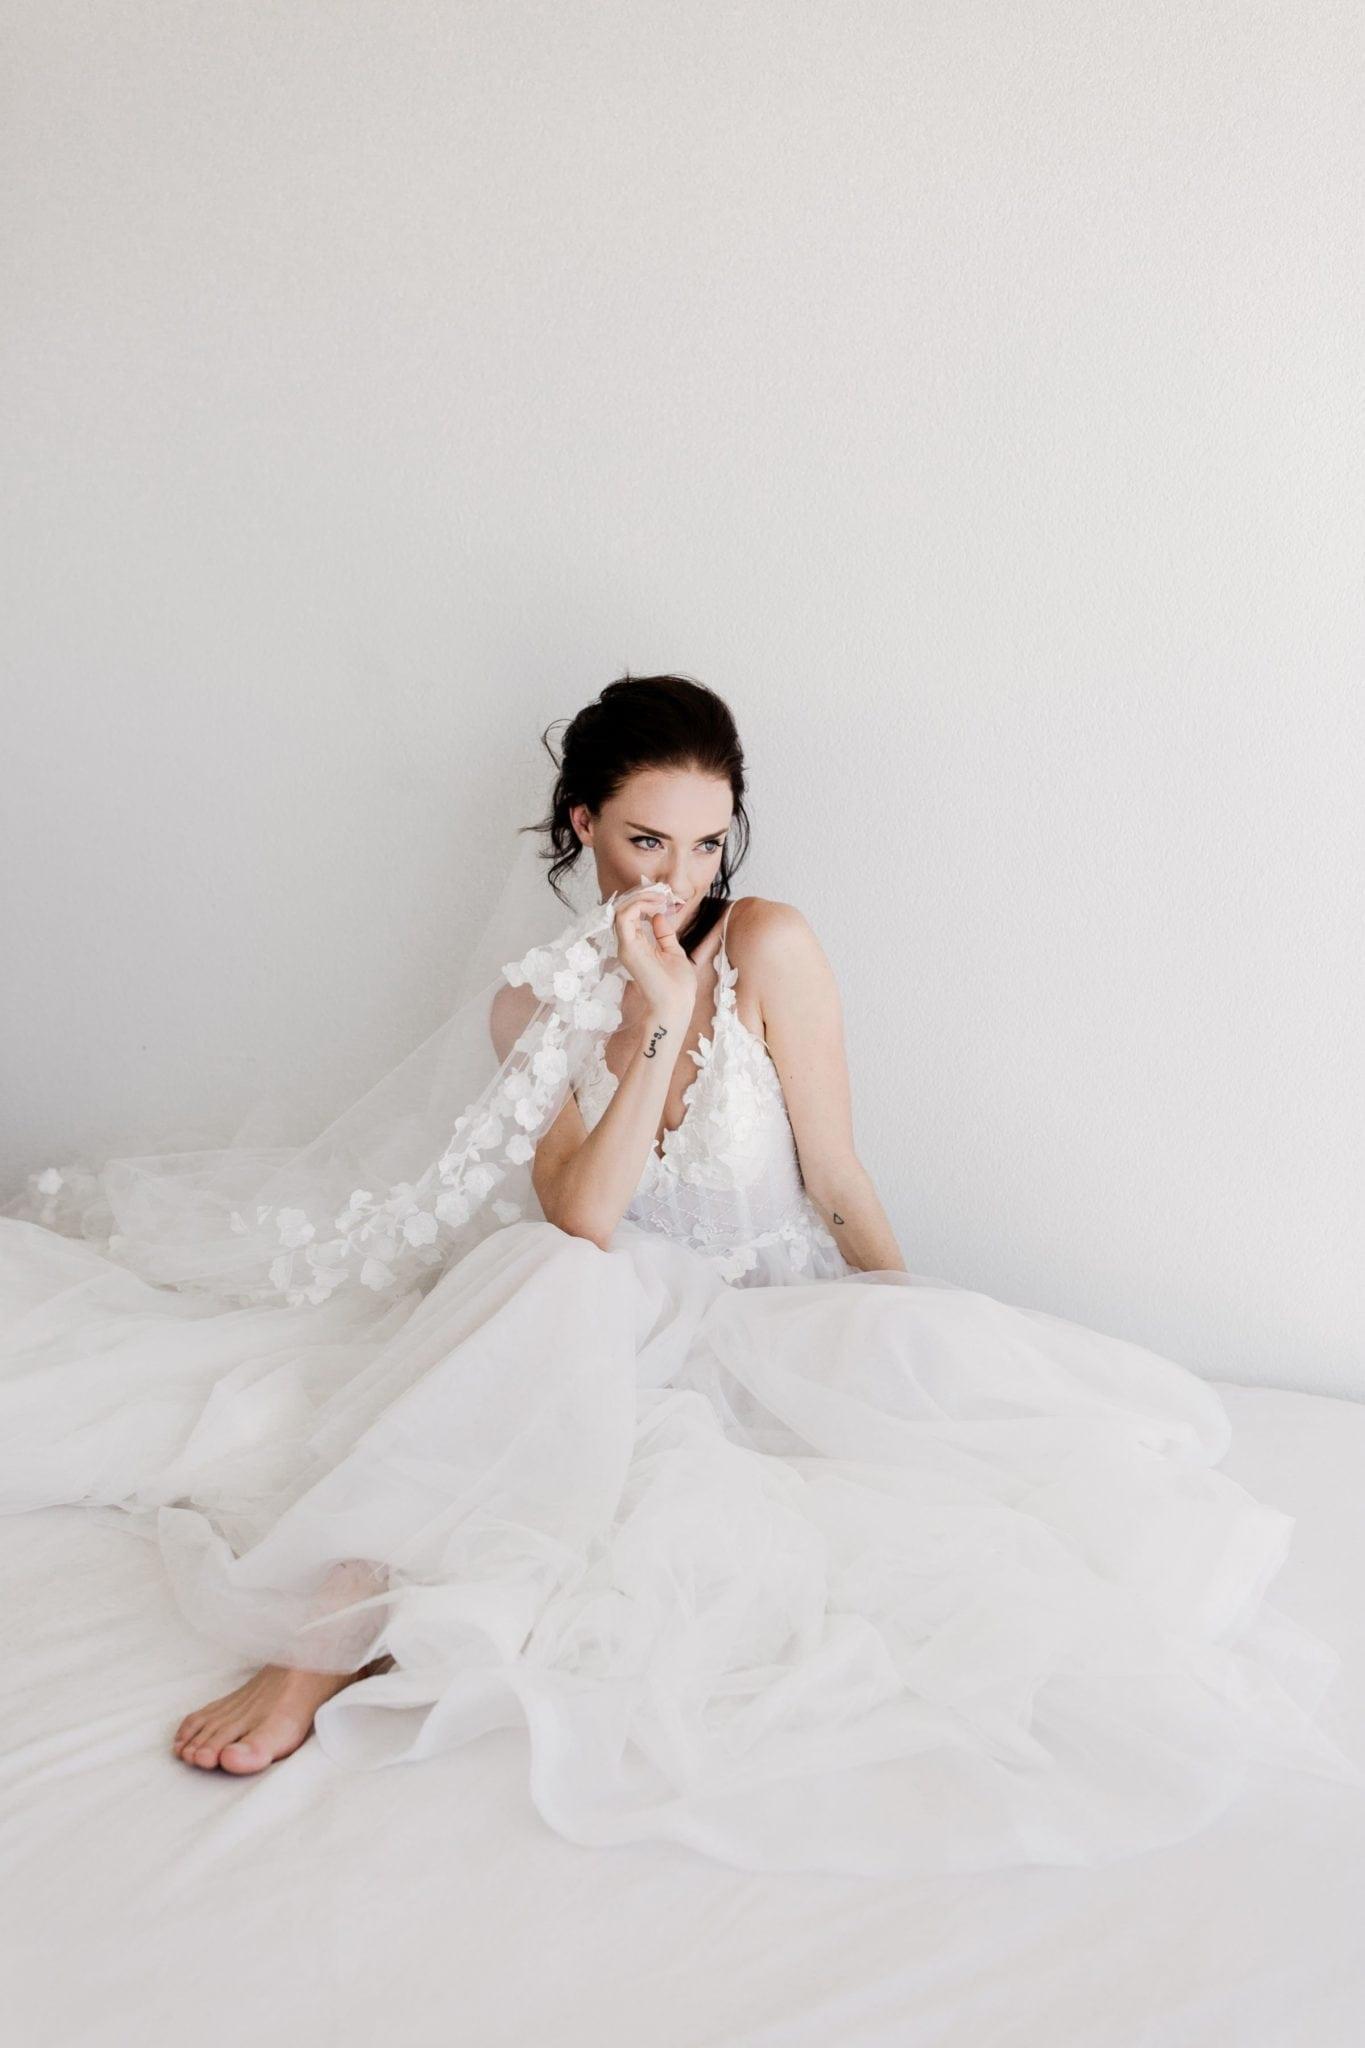 Hera_Somervell_Hand_Veil_Bed